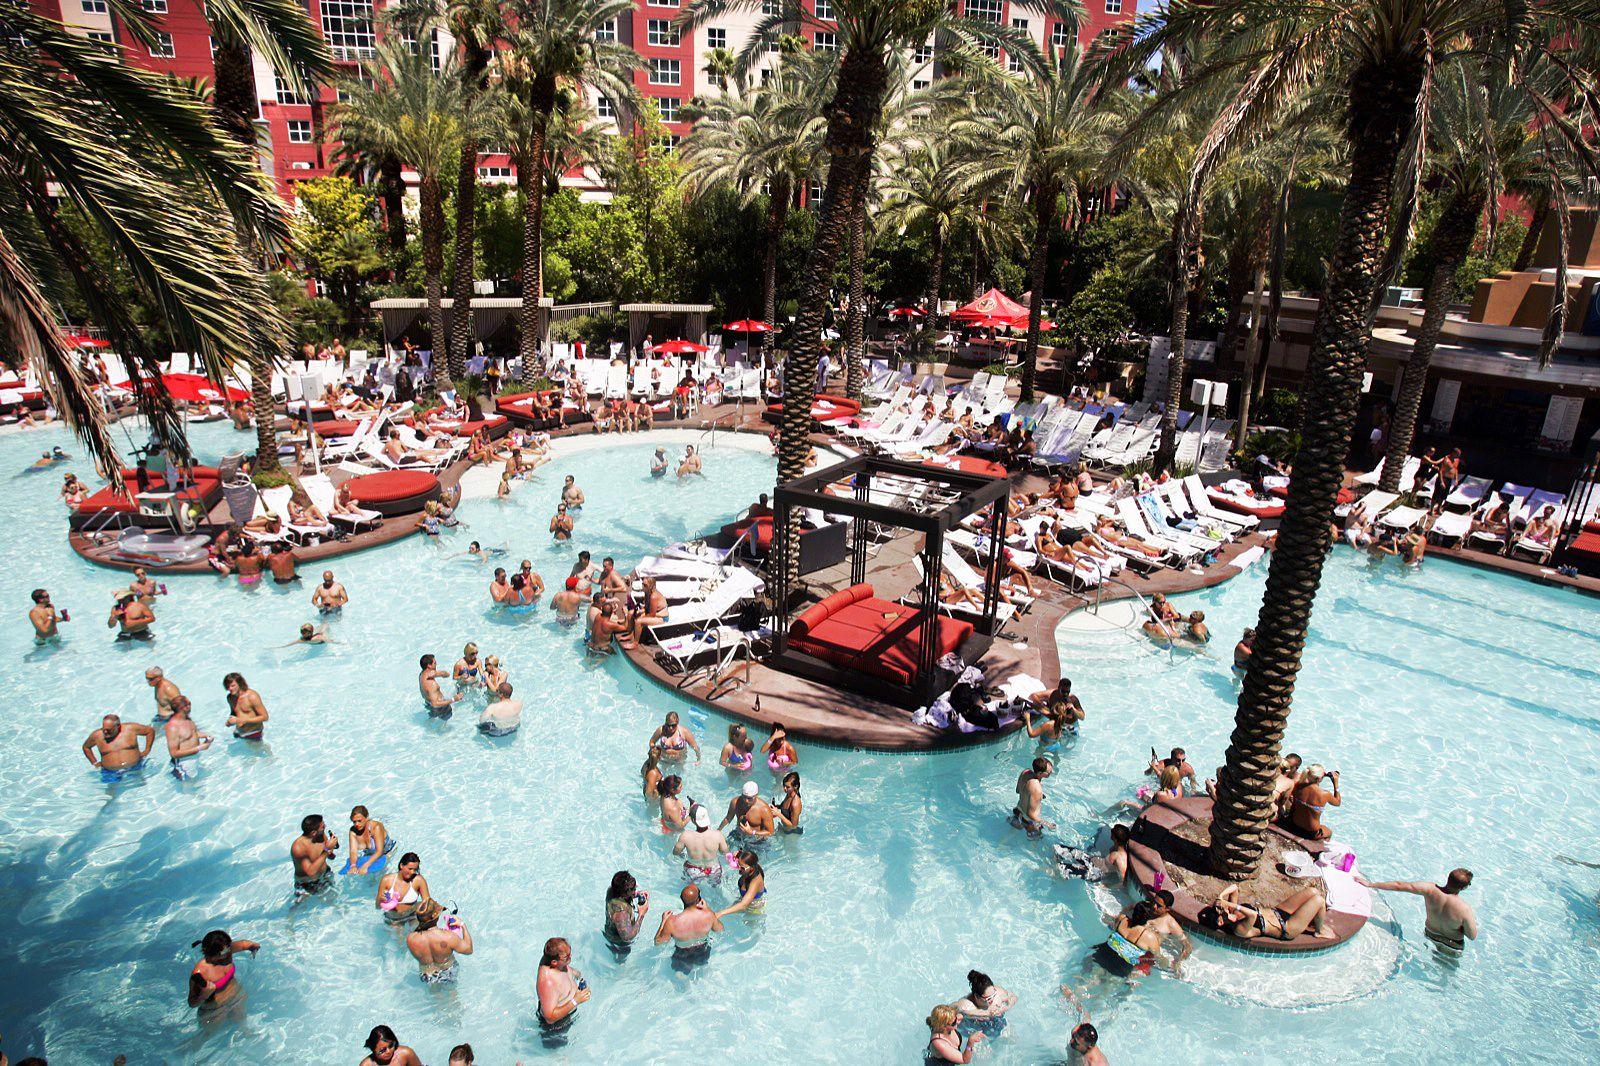 The Flamingo Las Vegas pool kicks it old school with lots